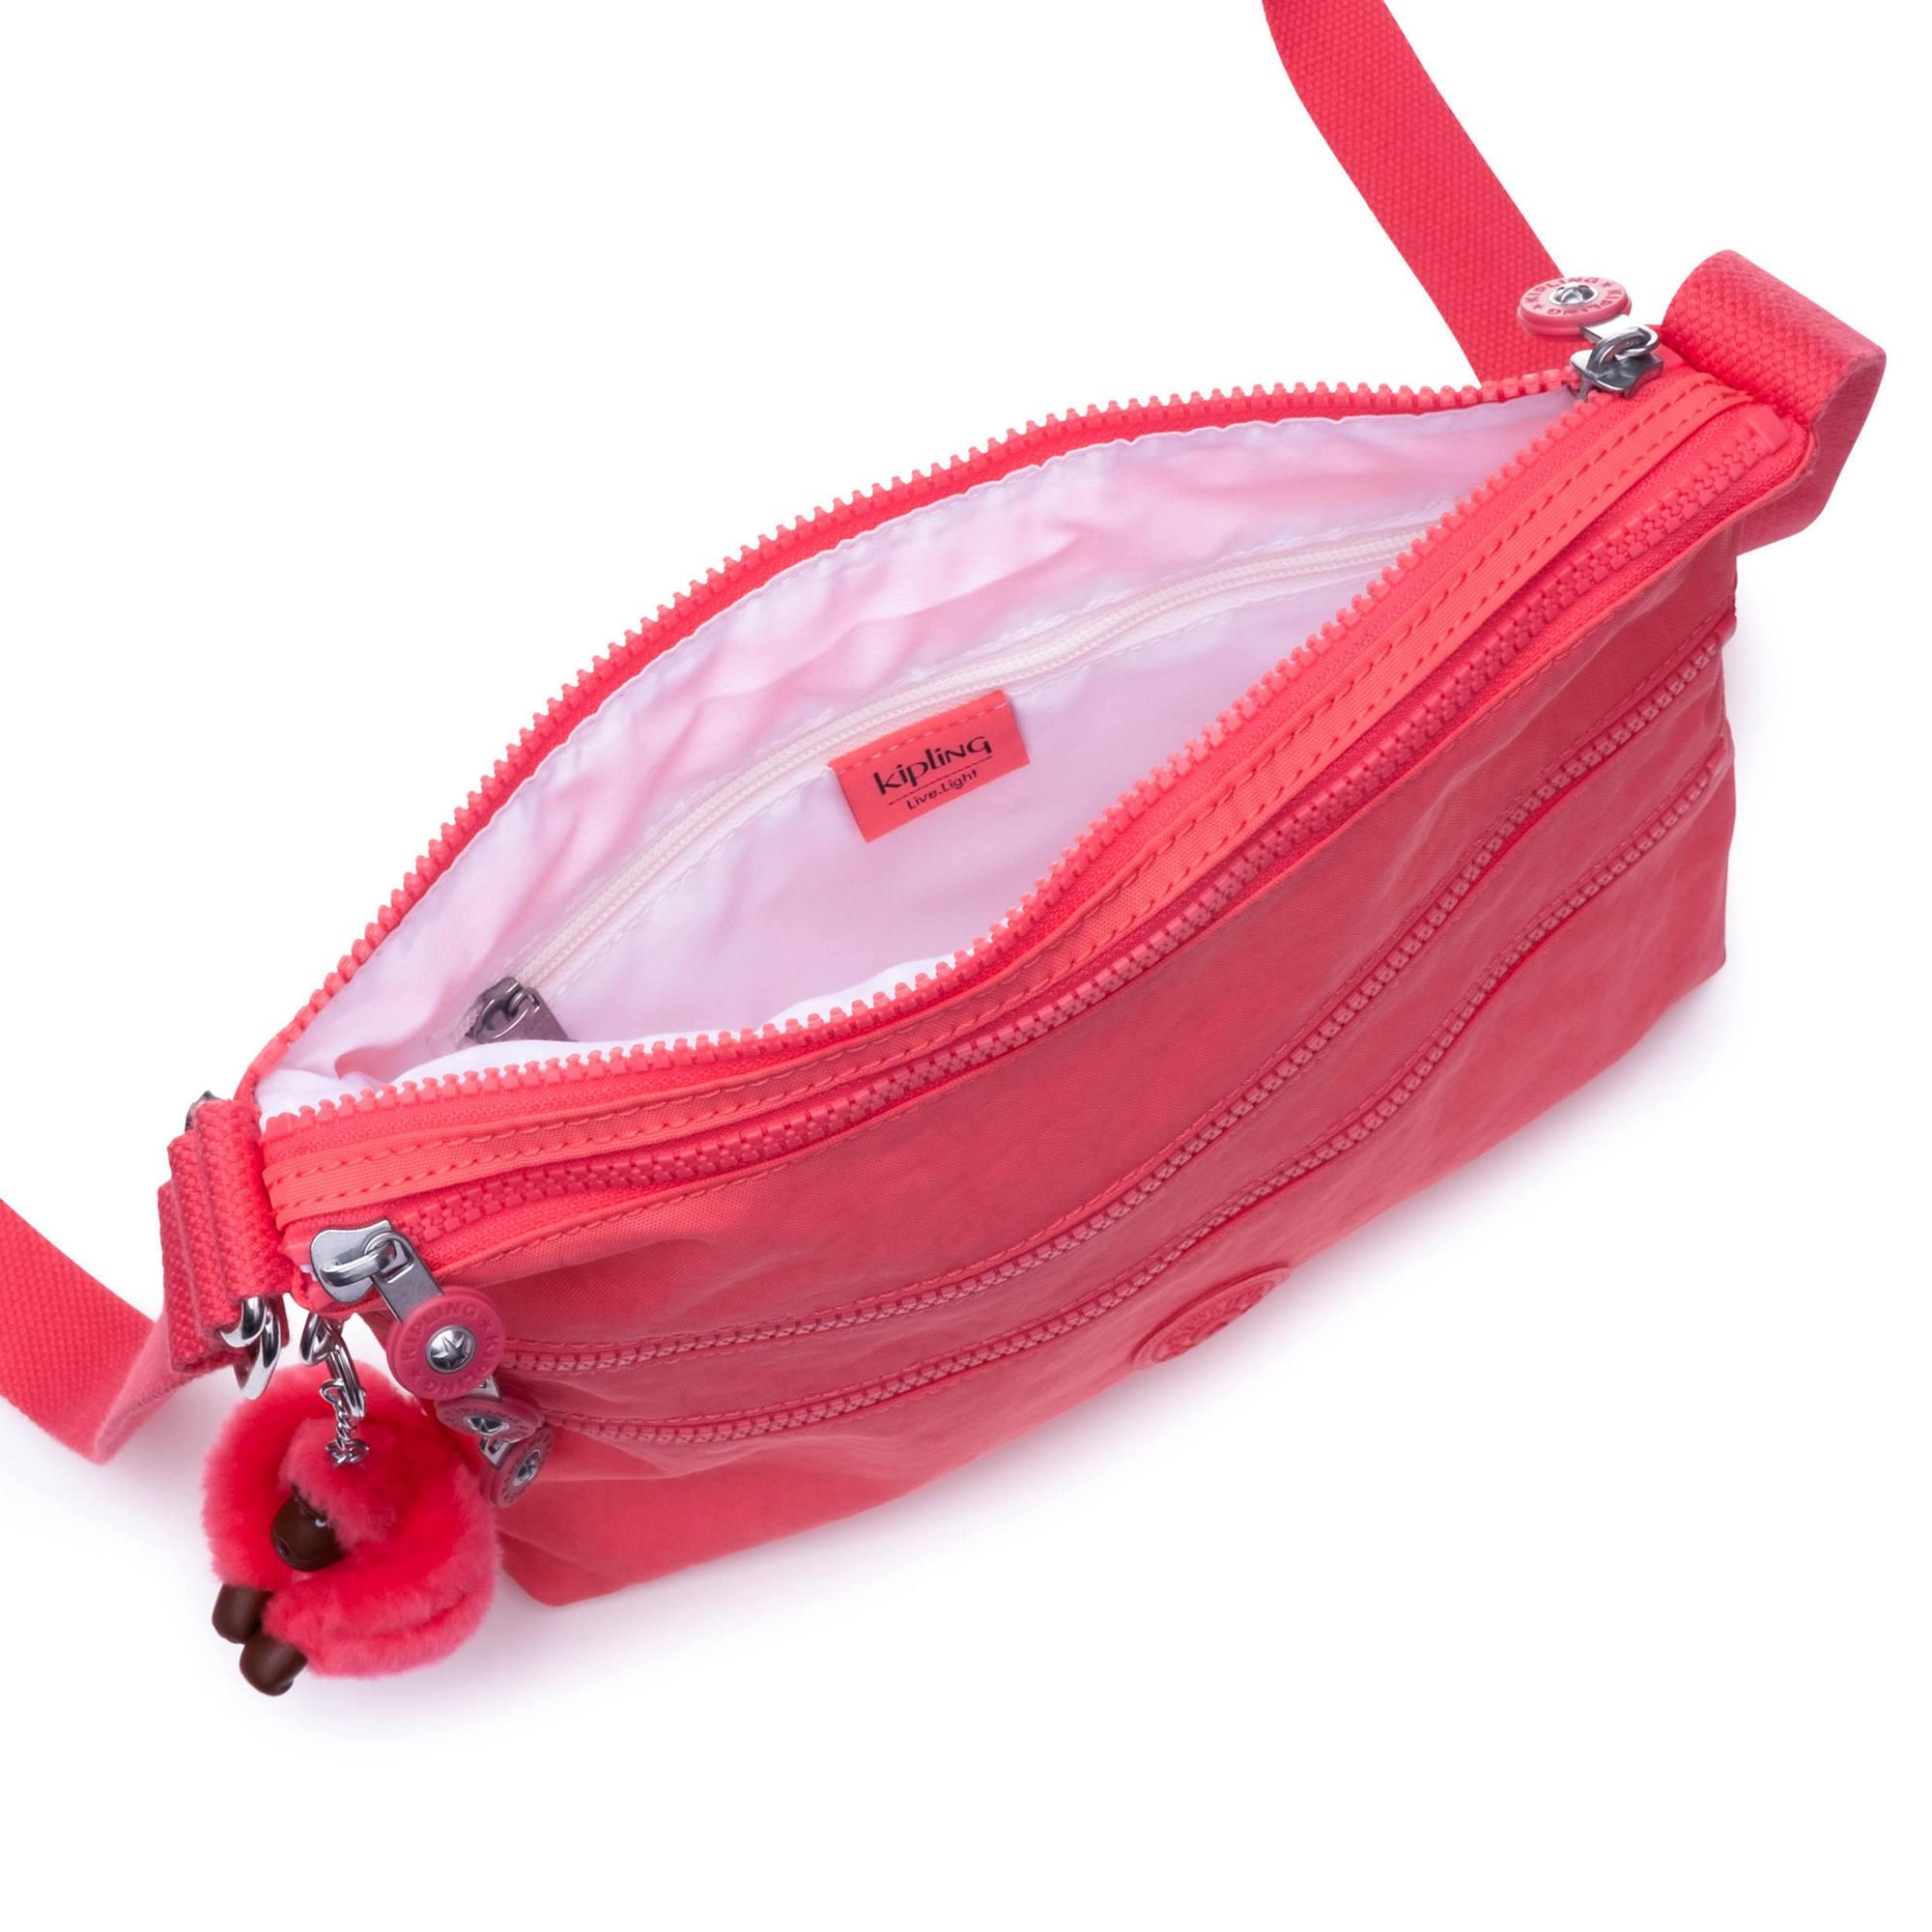 Kipling-Alvar-Metallic-Crossbody-Bag miniature 27